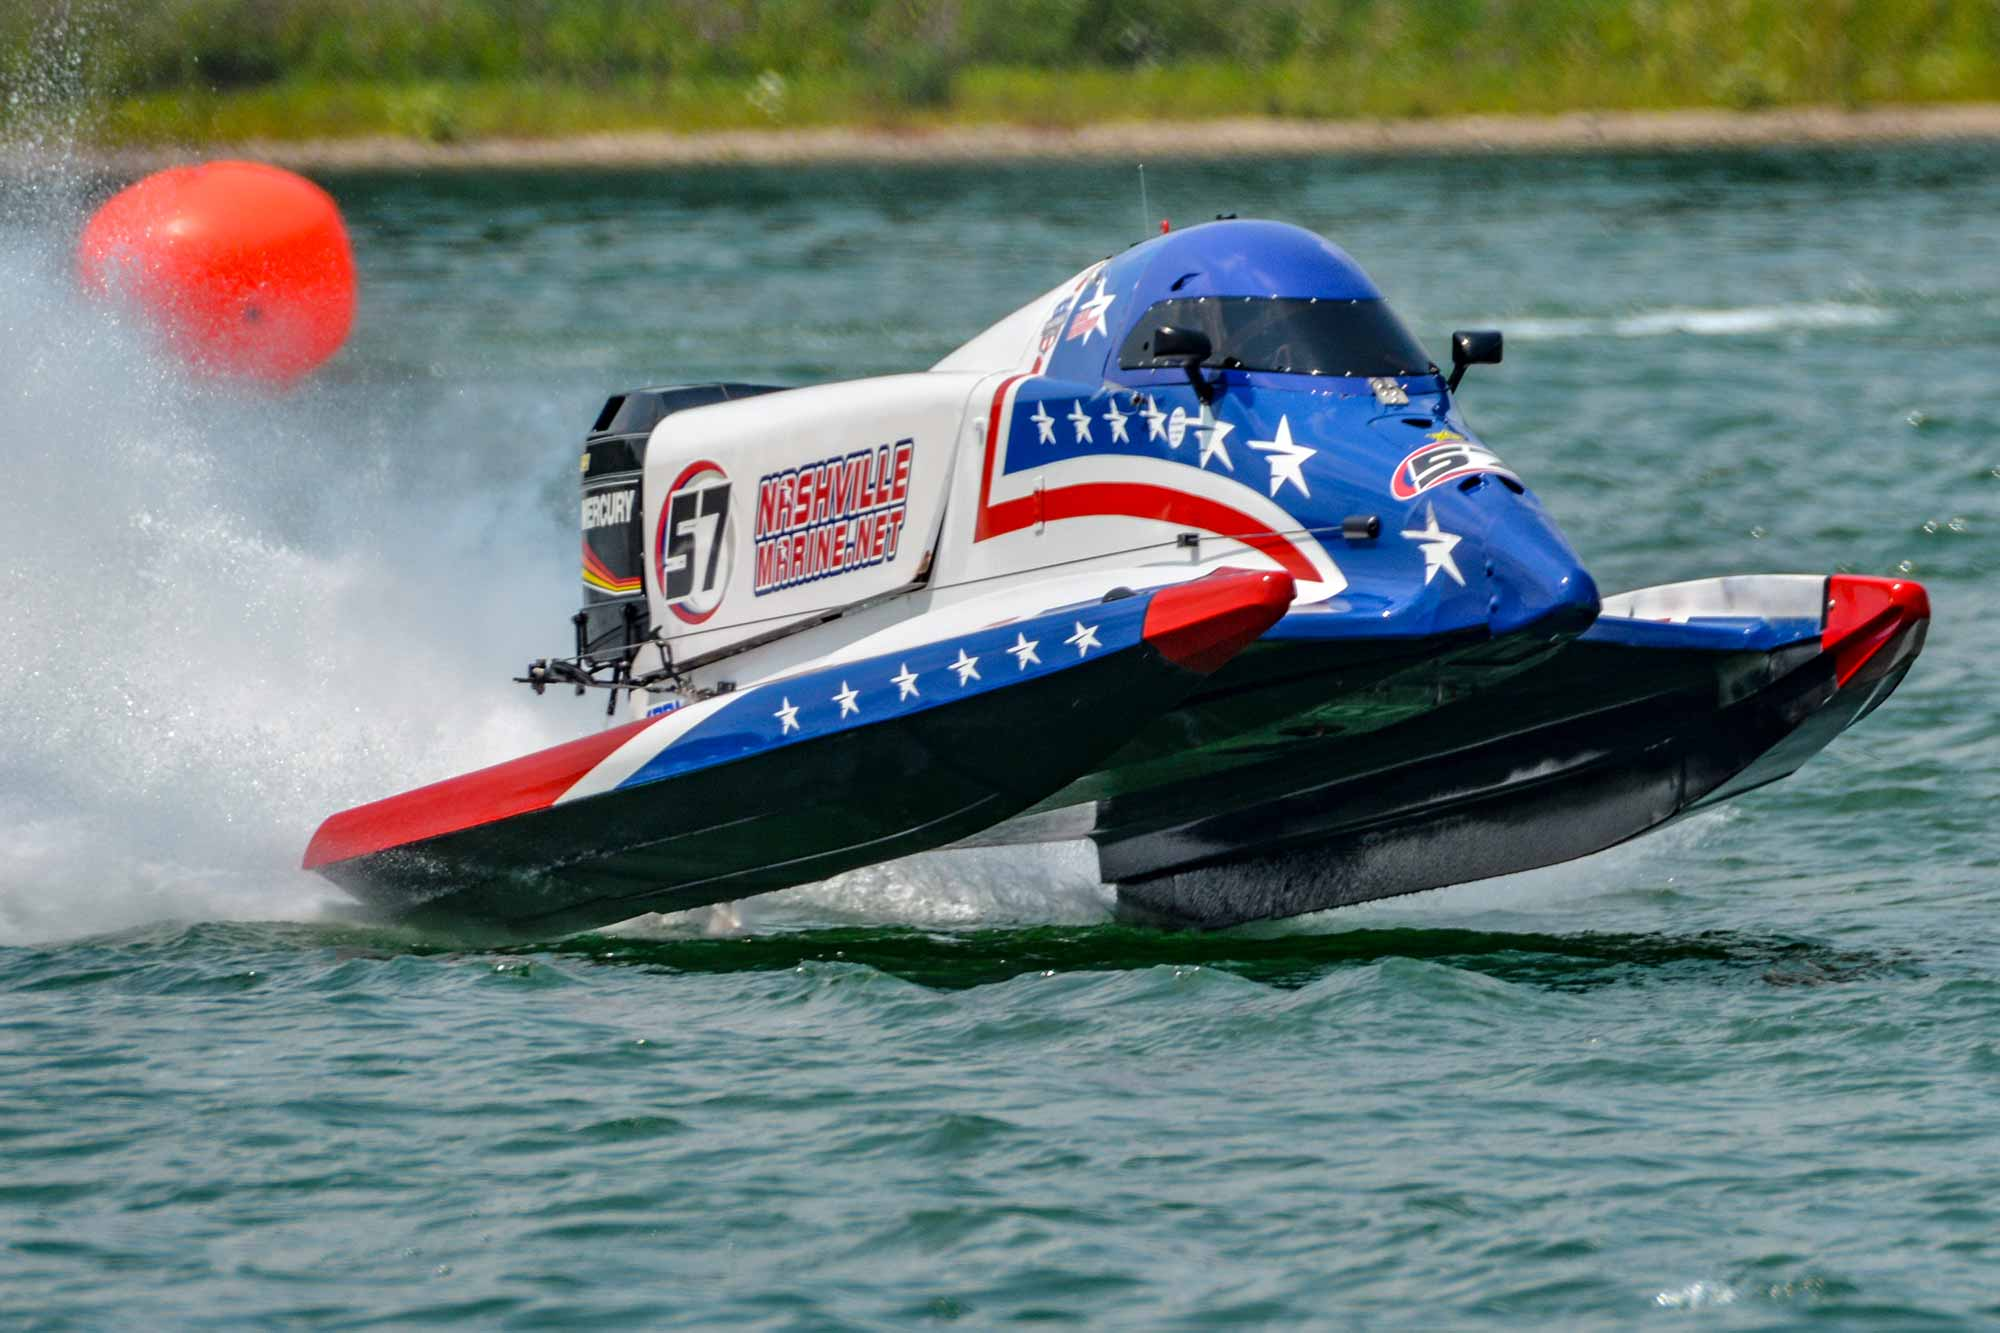 McMurray-Racing-Nashvill-Marine-2021-Springfield-F1-Race-53